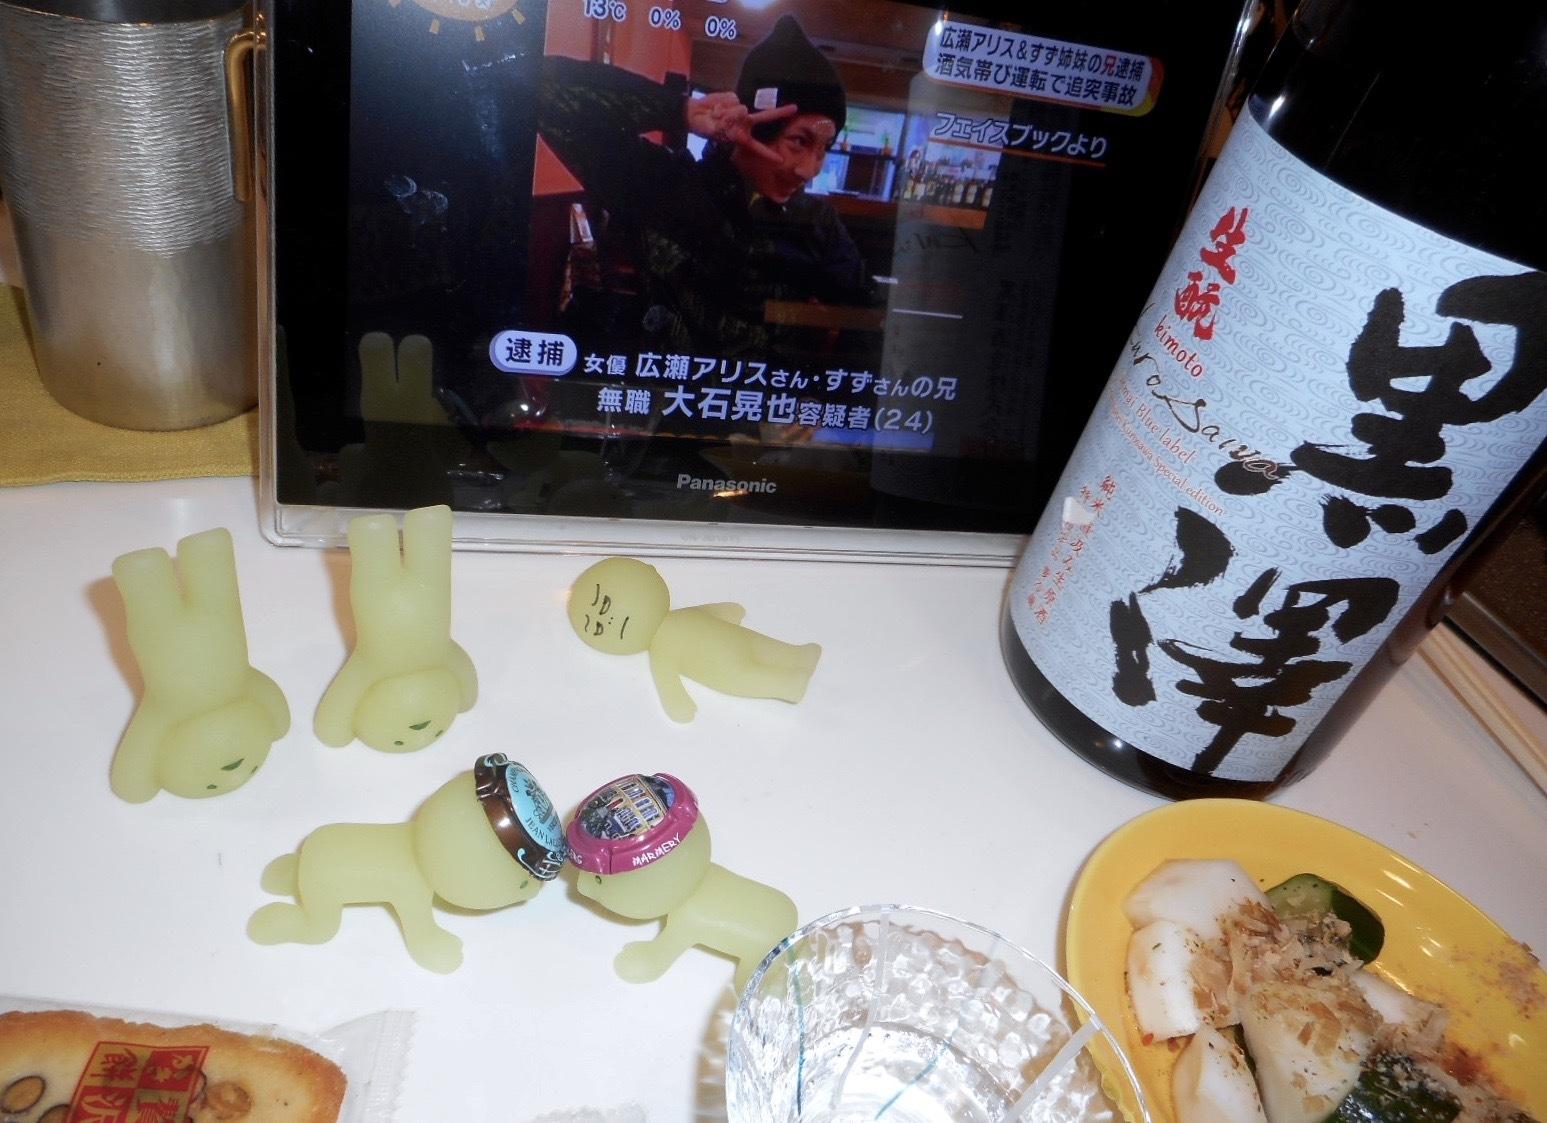 kurosawa_jikagumi_blue28by12.jpg